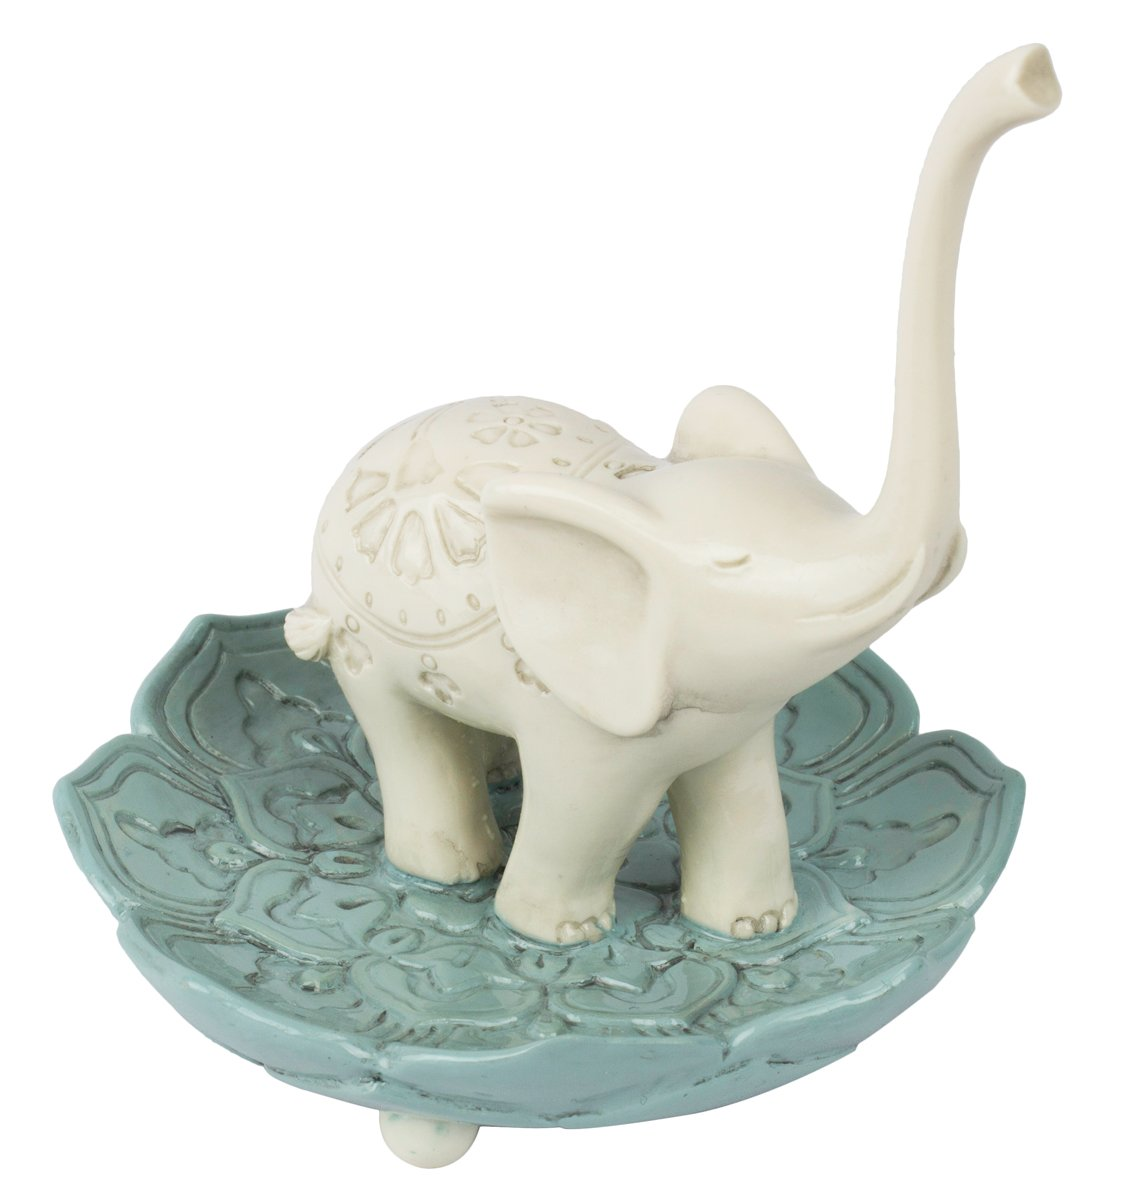 Grasslands Road Resin Good Luck Elephant Jewelry Ring Holder, White / Teal, Medium, 3.5'' x 3.5''